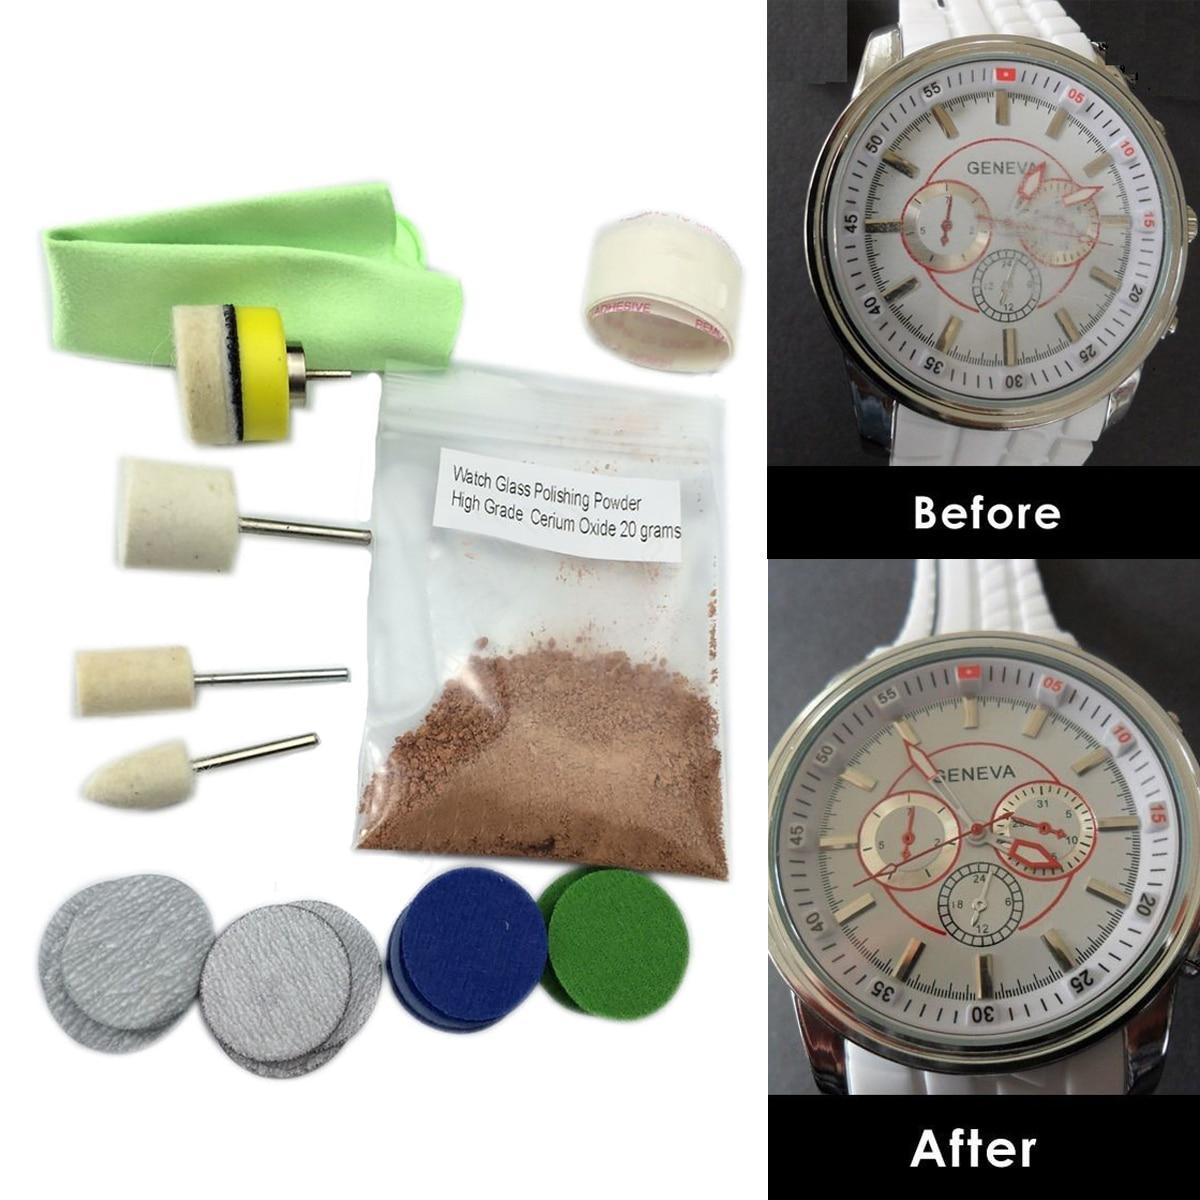 New Watch Glass Polishing Kit Glass Scratch Removal Set Acrylic Sapphire Crystal ossieao new watch glass polishing kit glass scratch removal set acrylic sapphire crystal